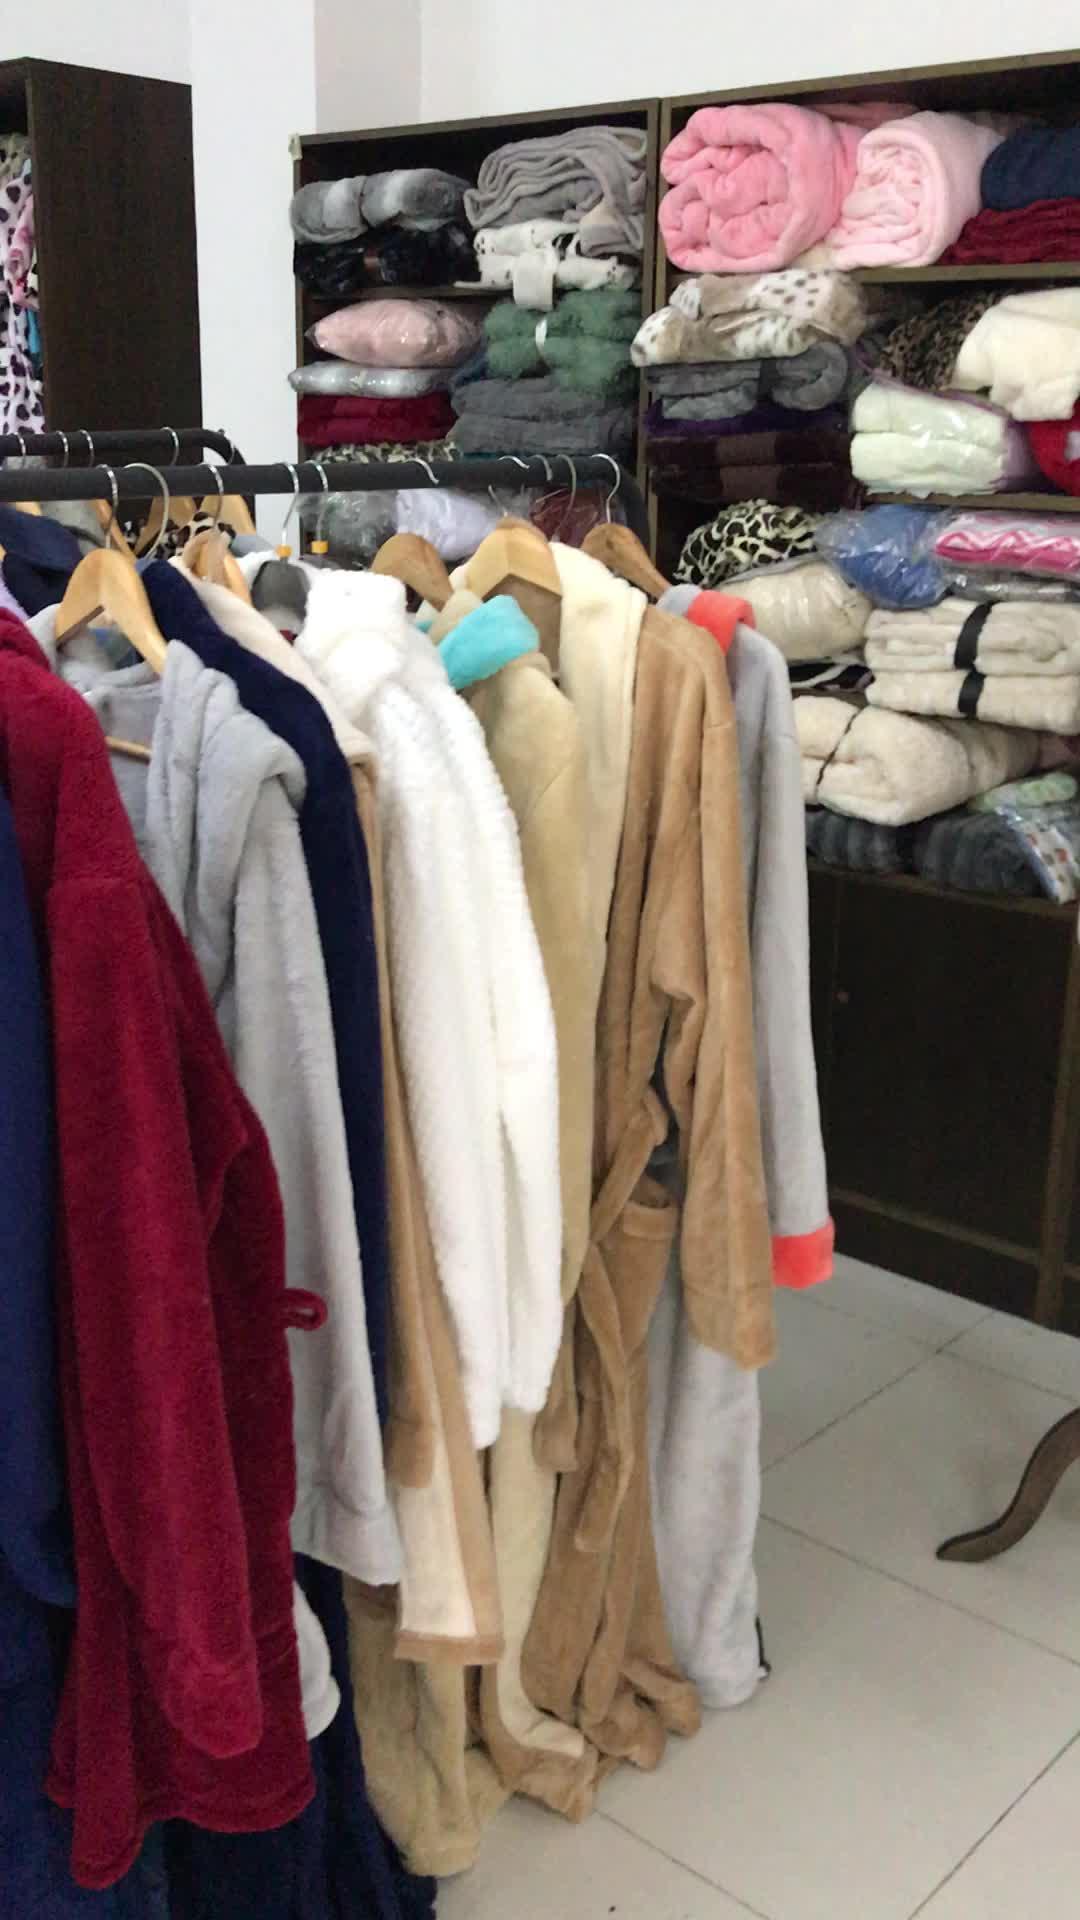 Chine Fabrication Femmes Costume De Nuit/Pyjama/Pyjama